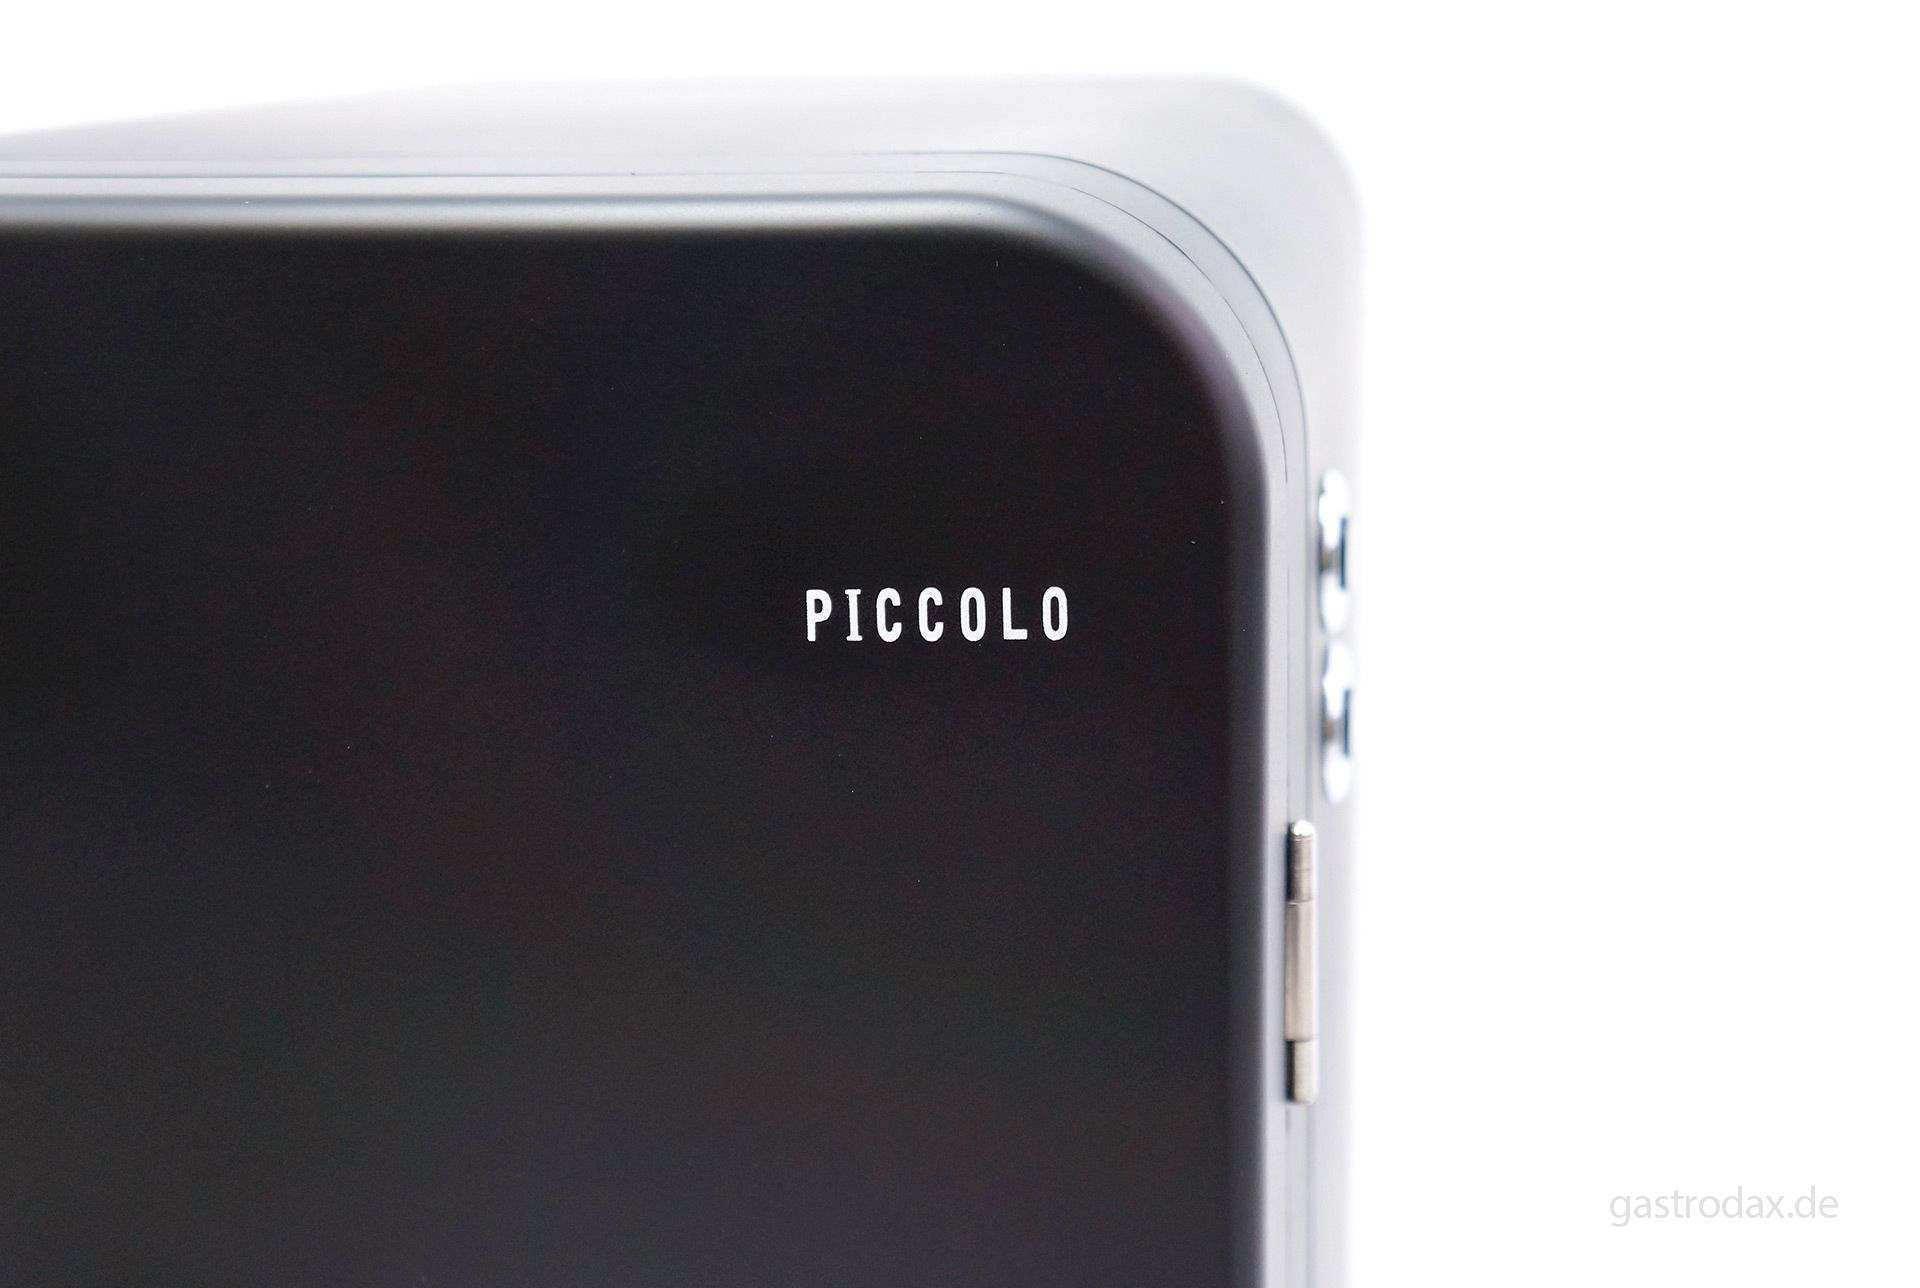 Mini Kühlschrank Piccolo : ✪ jura milk cooler piccolo milchkühler kaffeetechnik